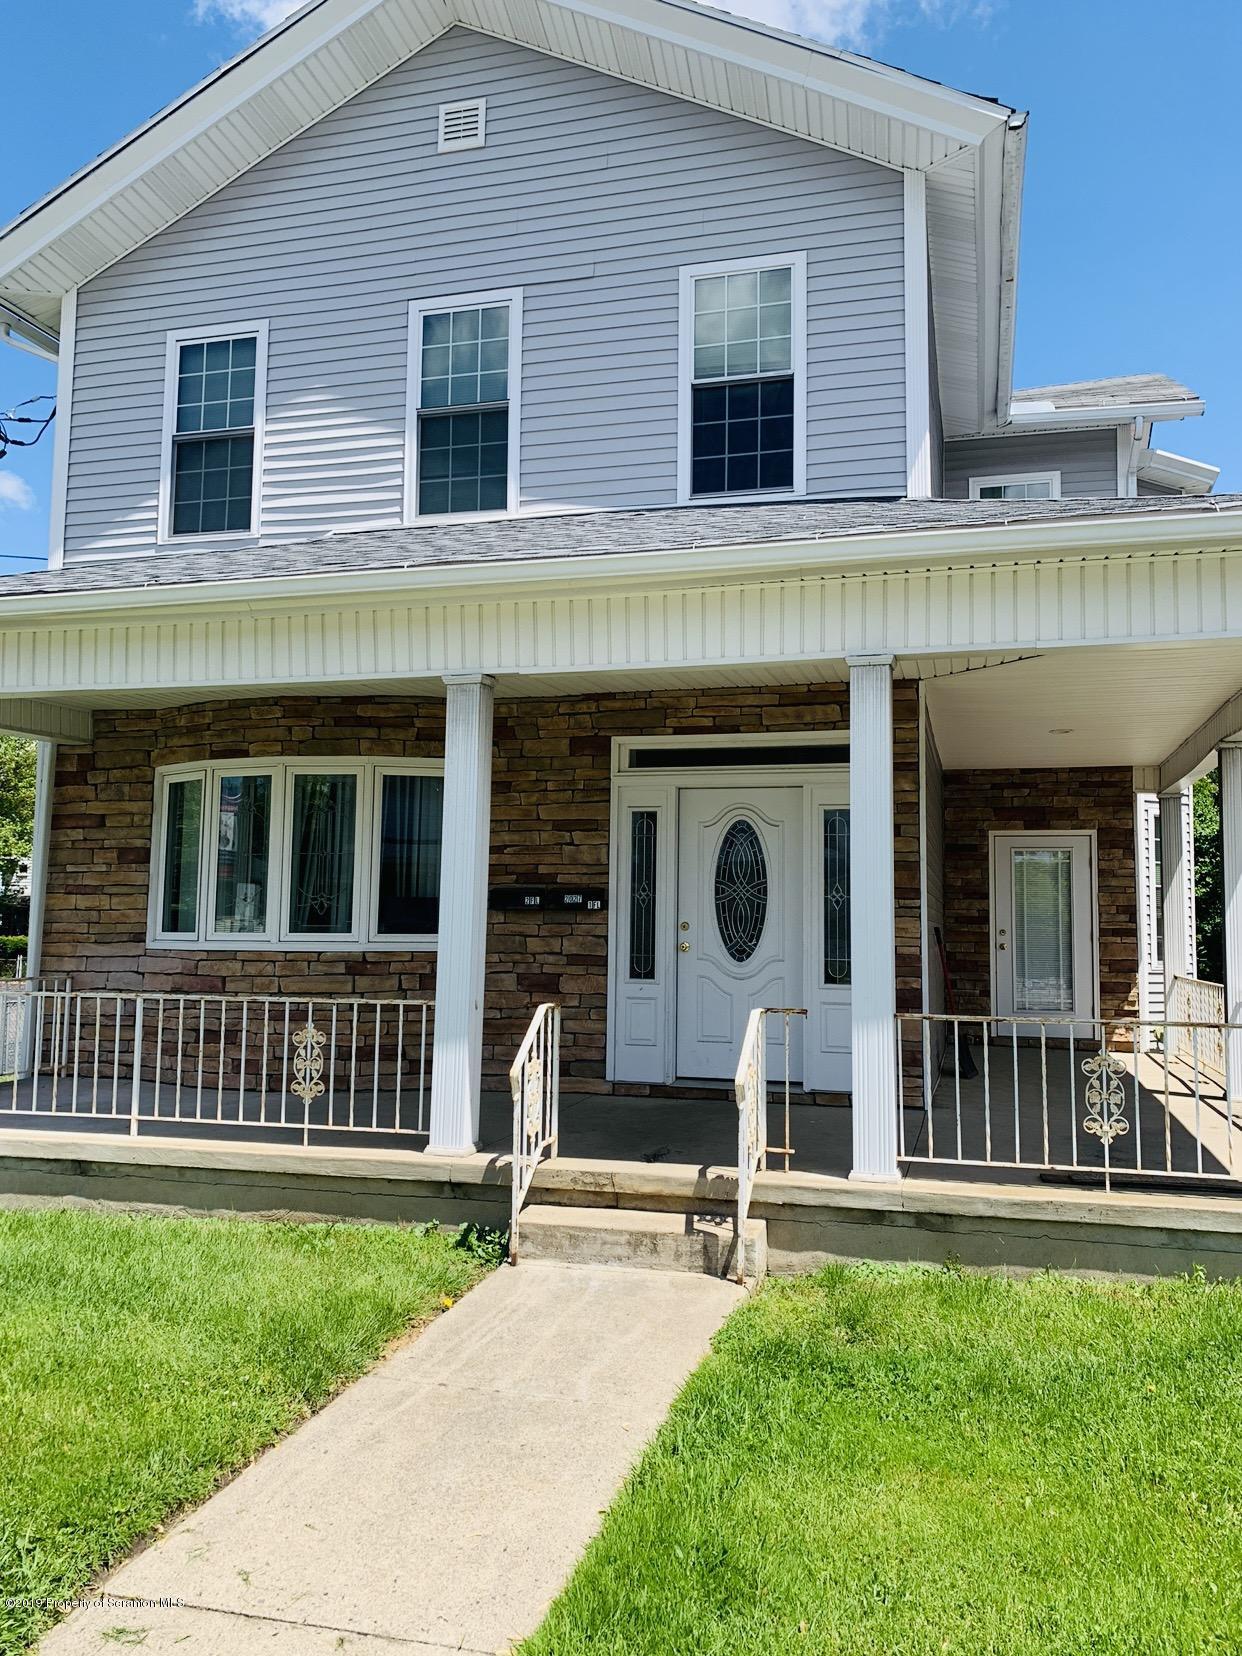 2027 Green Ridge St, Dunmore, Pennsylvania 18512, 4 Bedrooms Bedrooms, 5 Rooms Rooms,1 BathroomBathrooms,Rental,For Lease,Green Ridge,19-2444